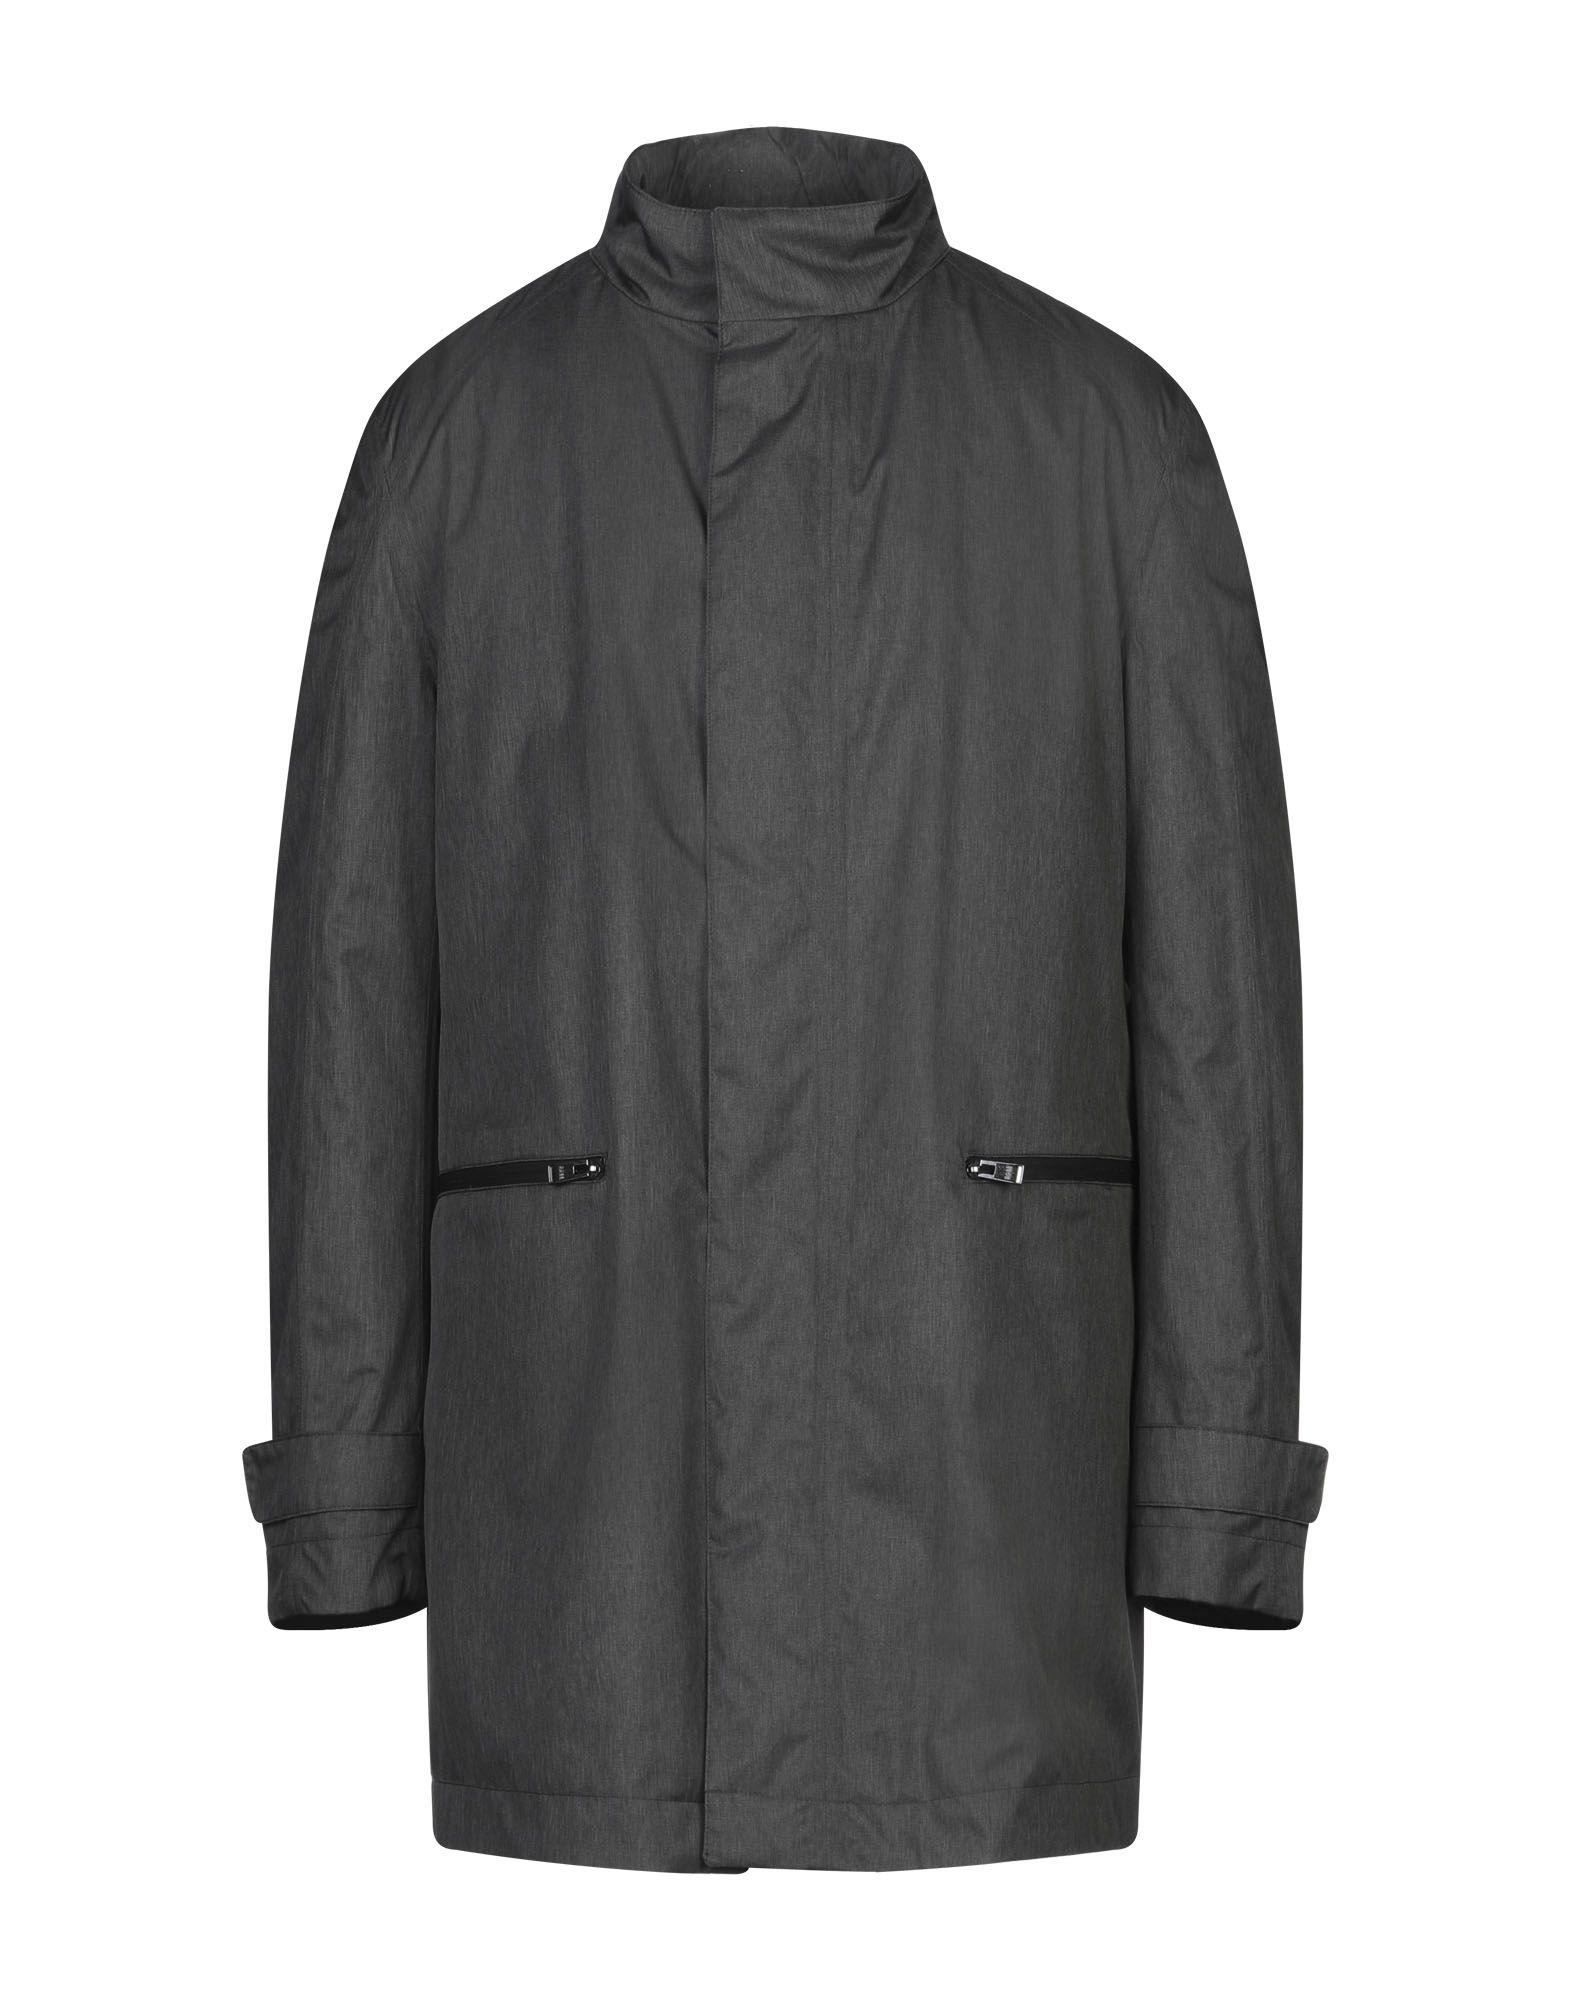 BOSS HUGO BOSS Куртка boss green куртка с фактурной отделкой